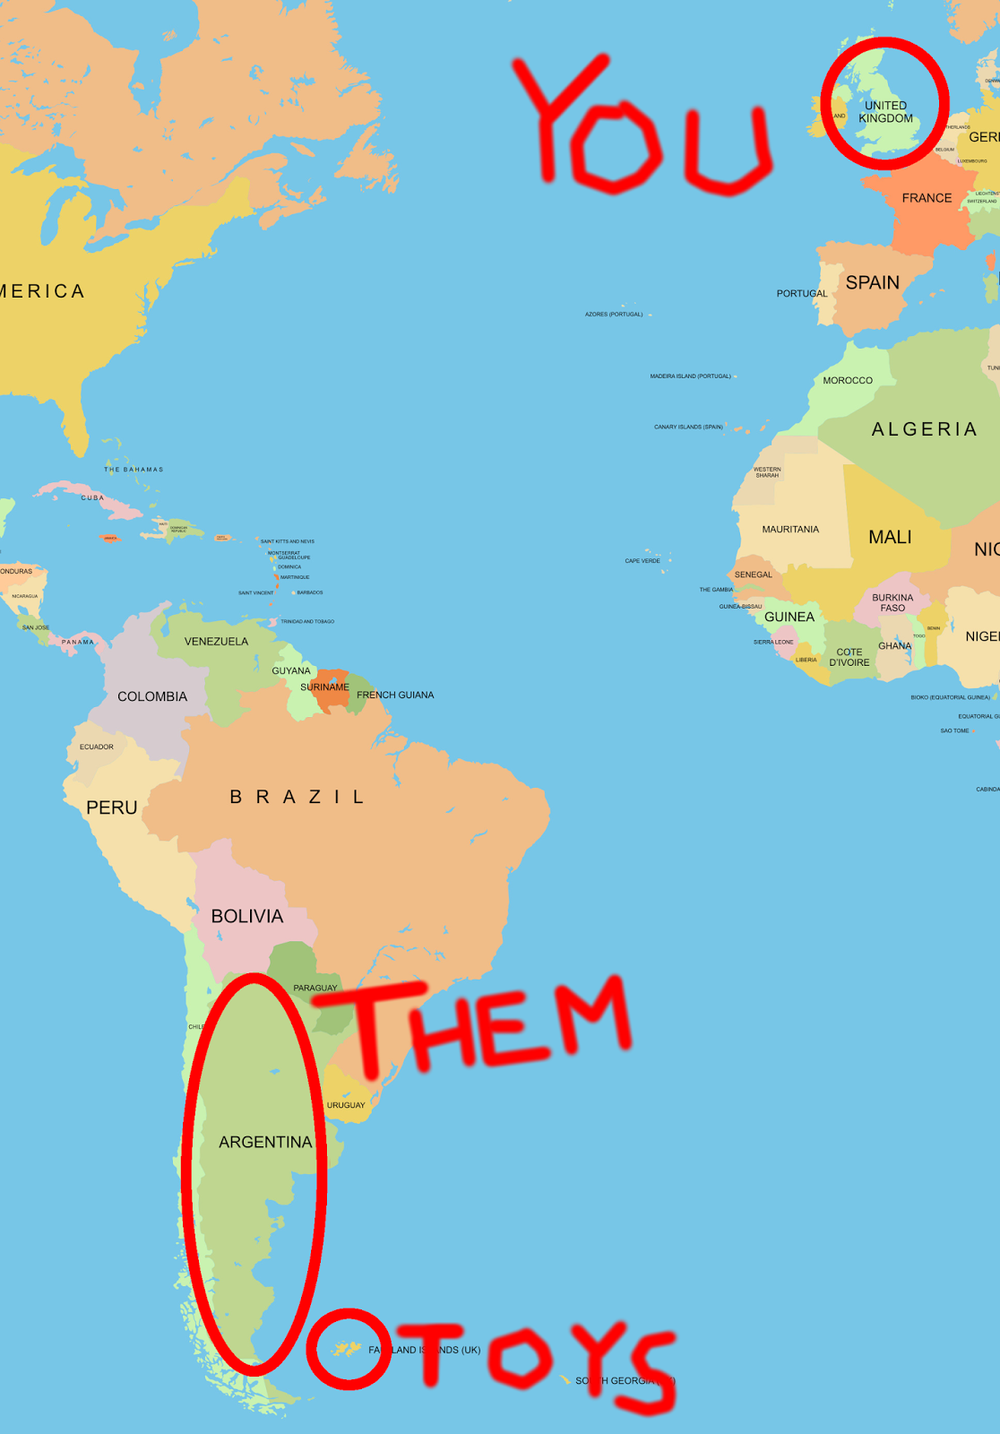 Map based metaphor